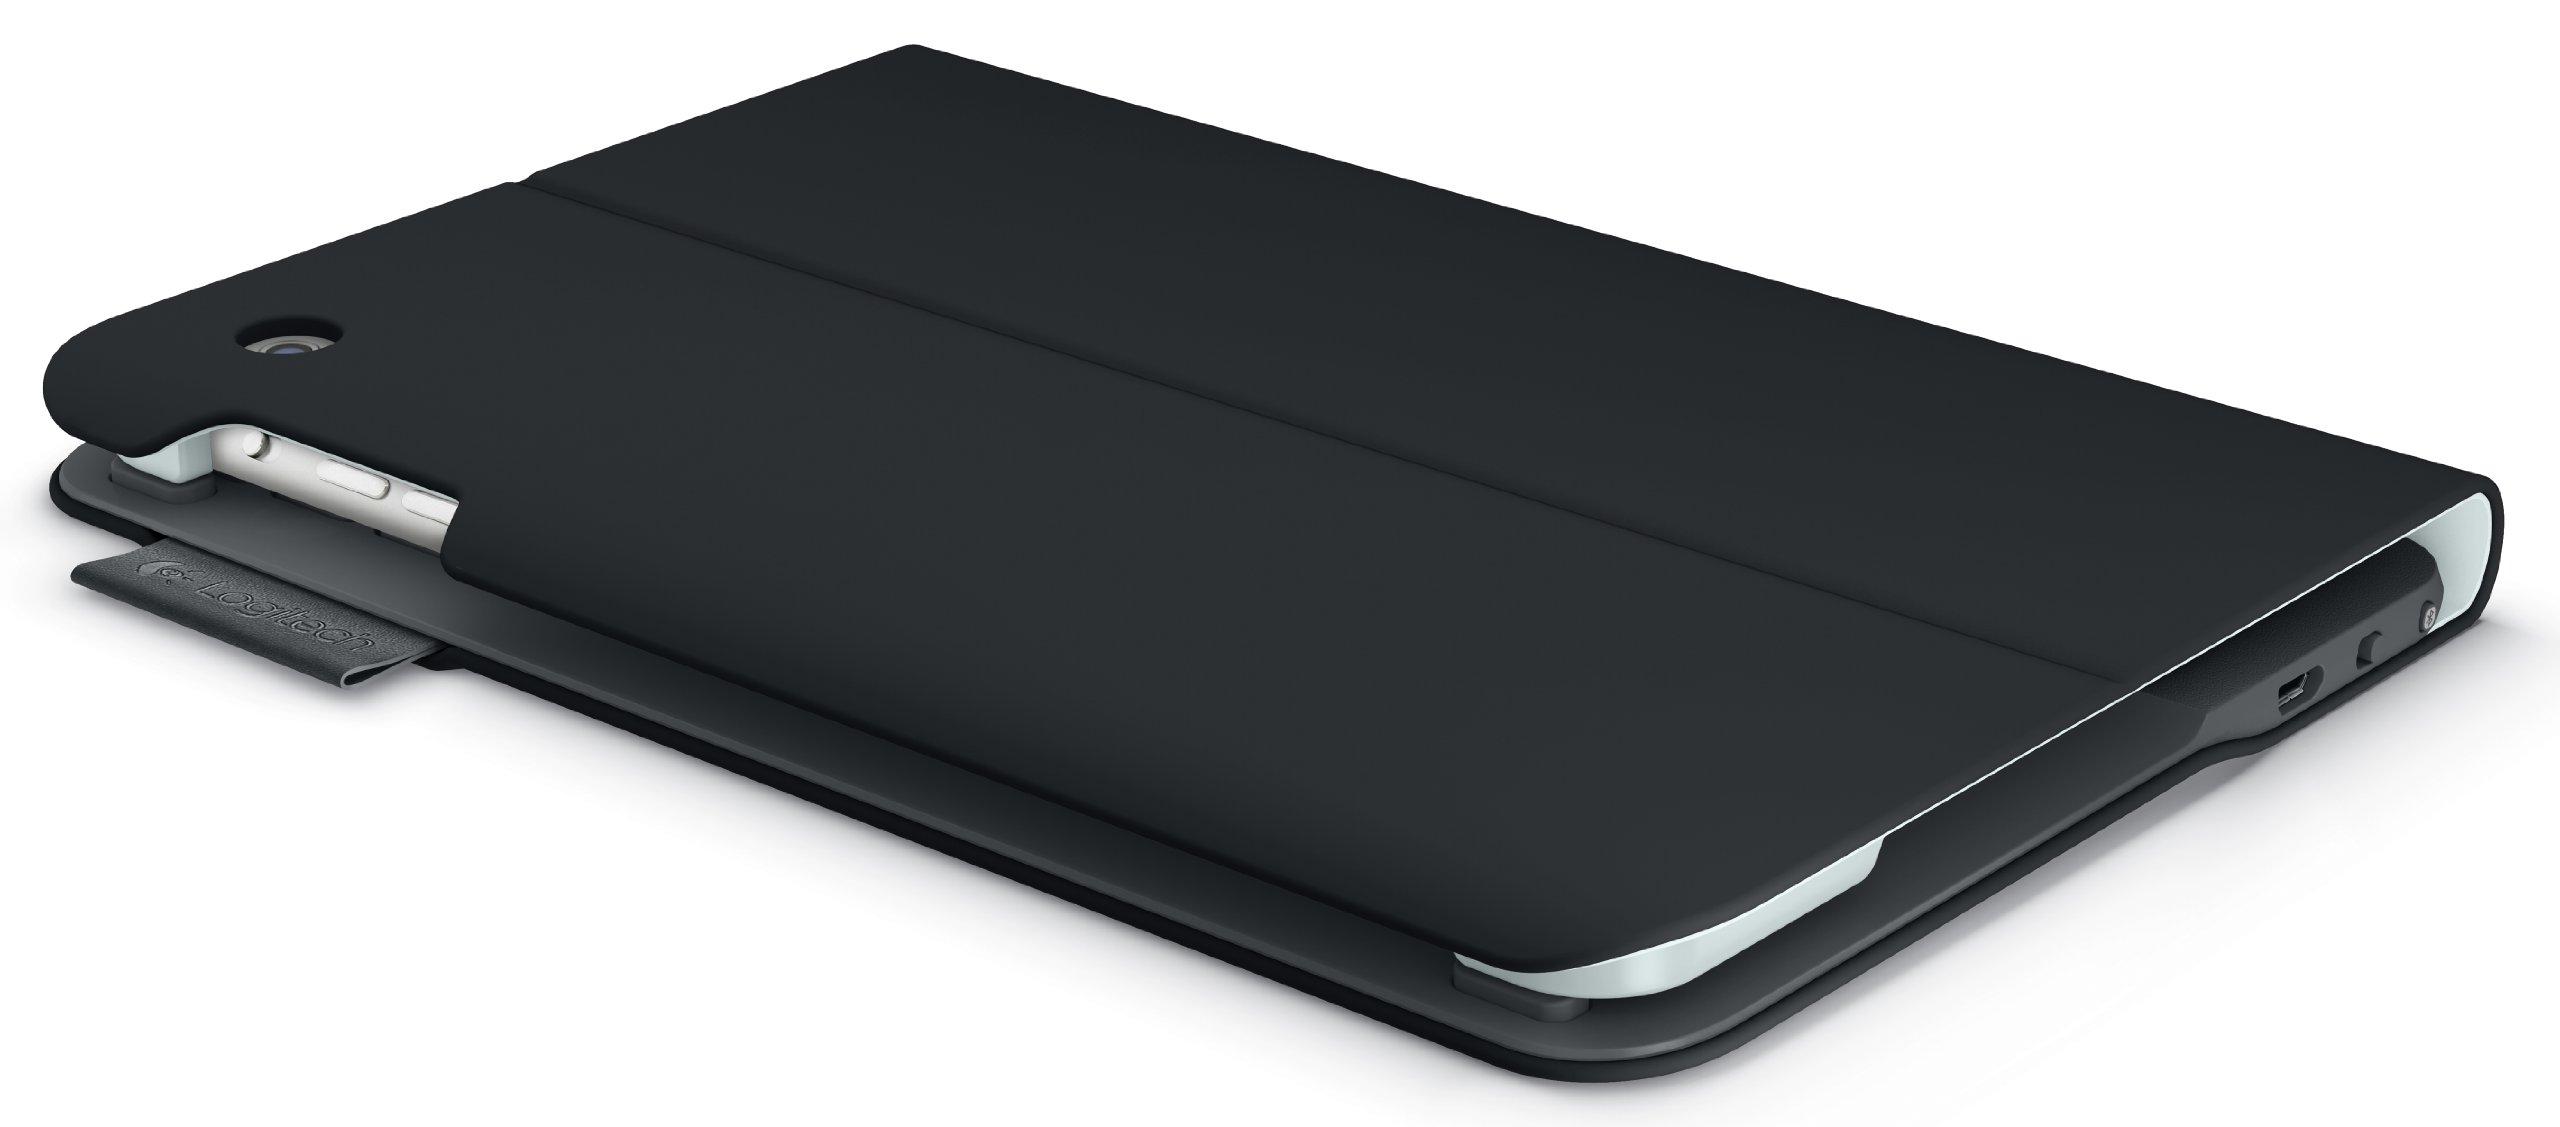 Logitech Ultrathin Keyboard Folio for iPad mini - Carbon Black